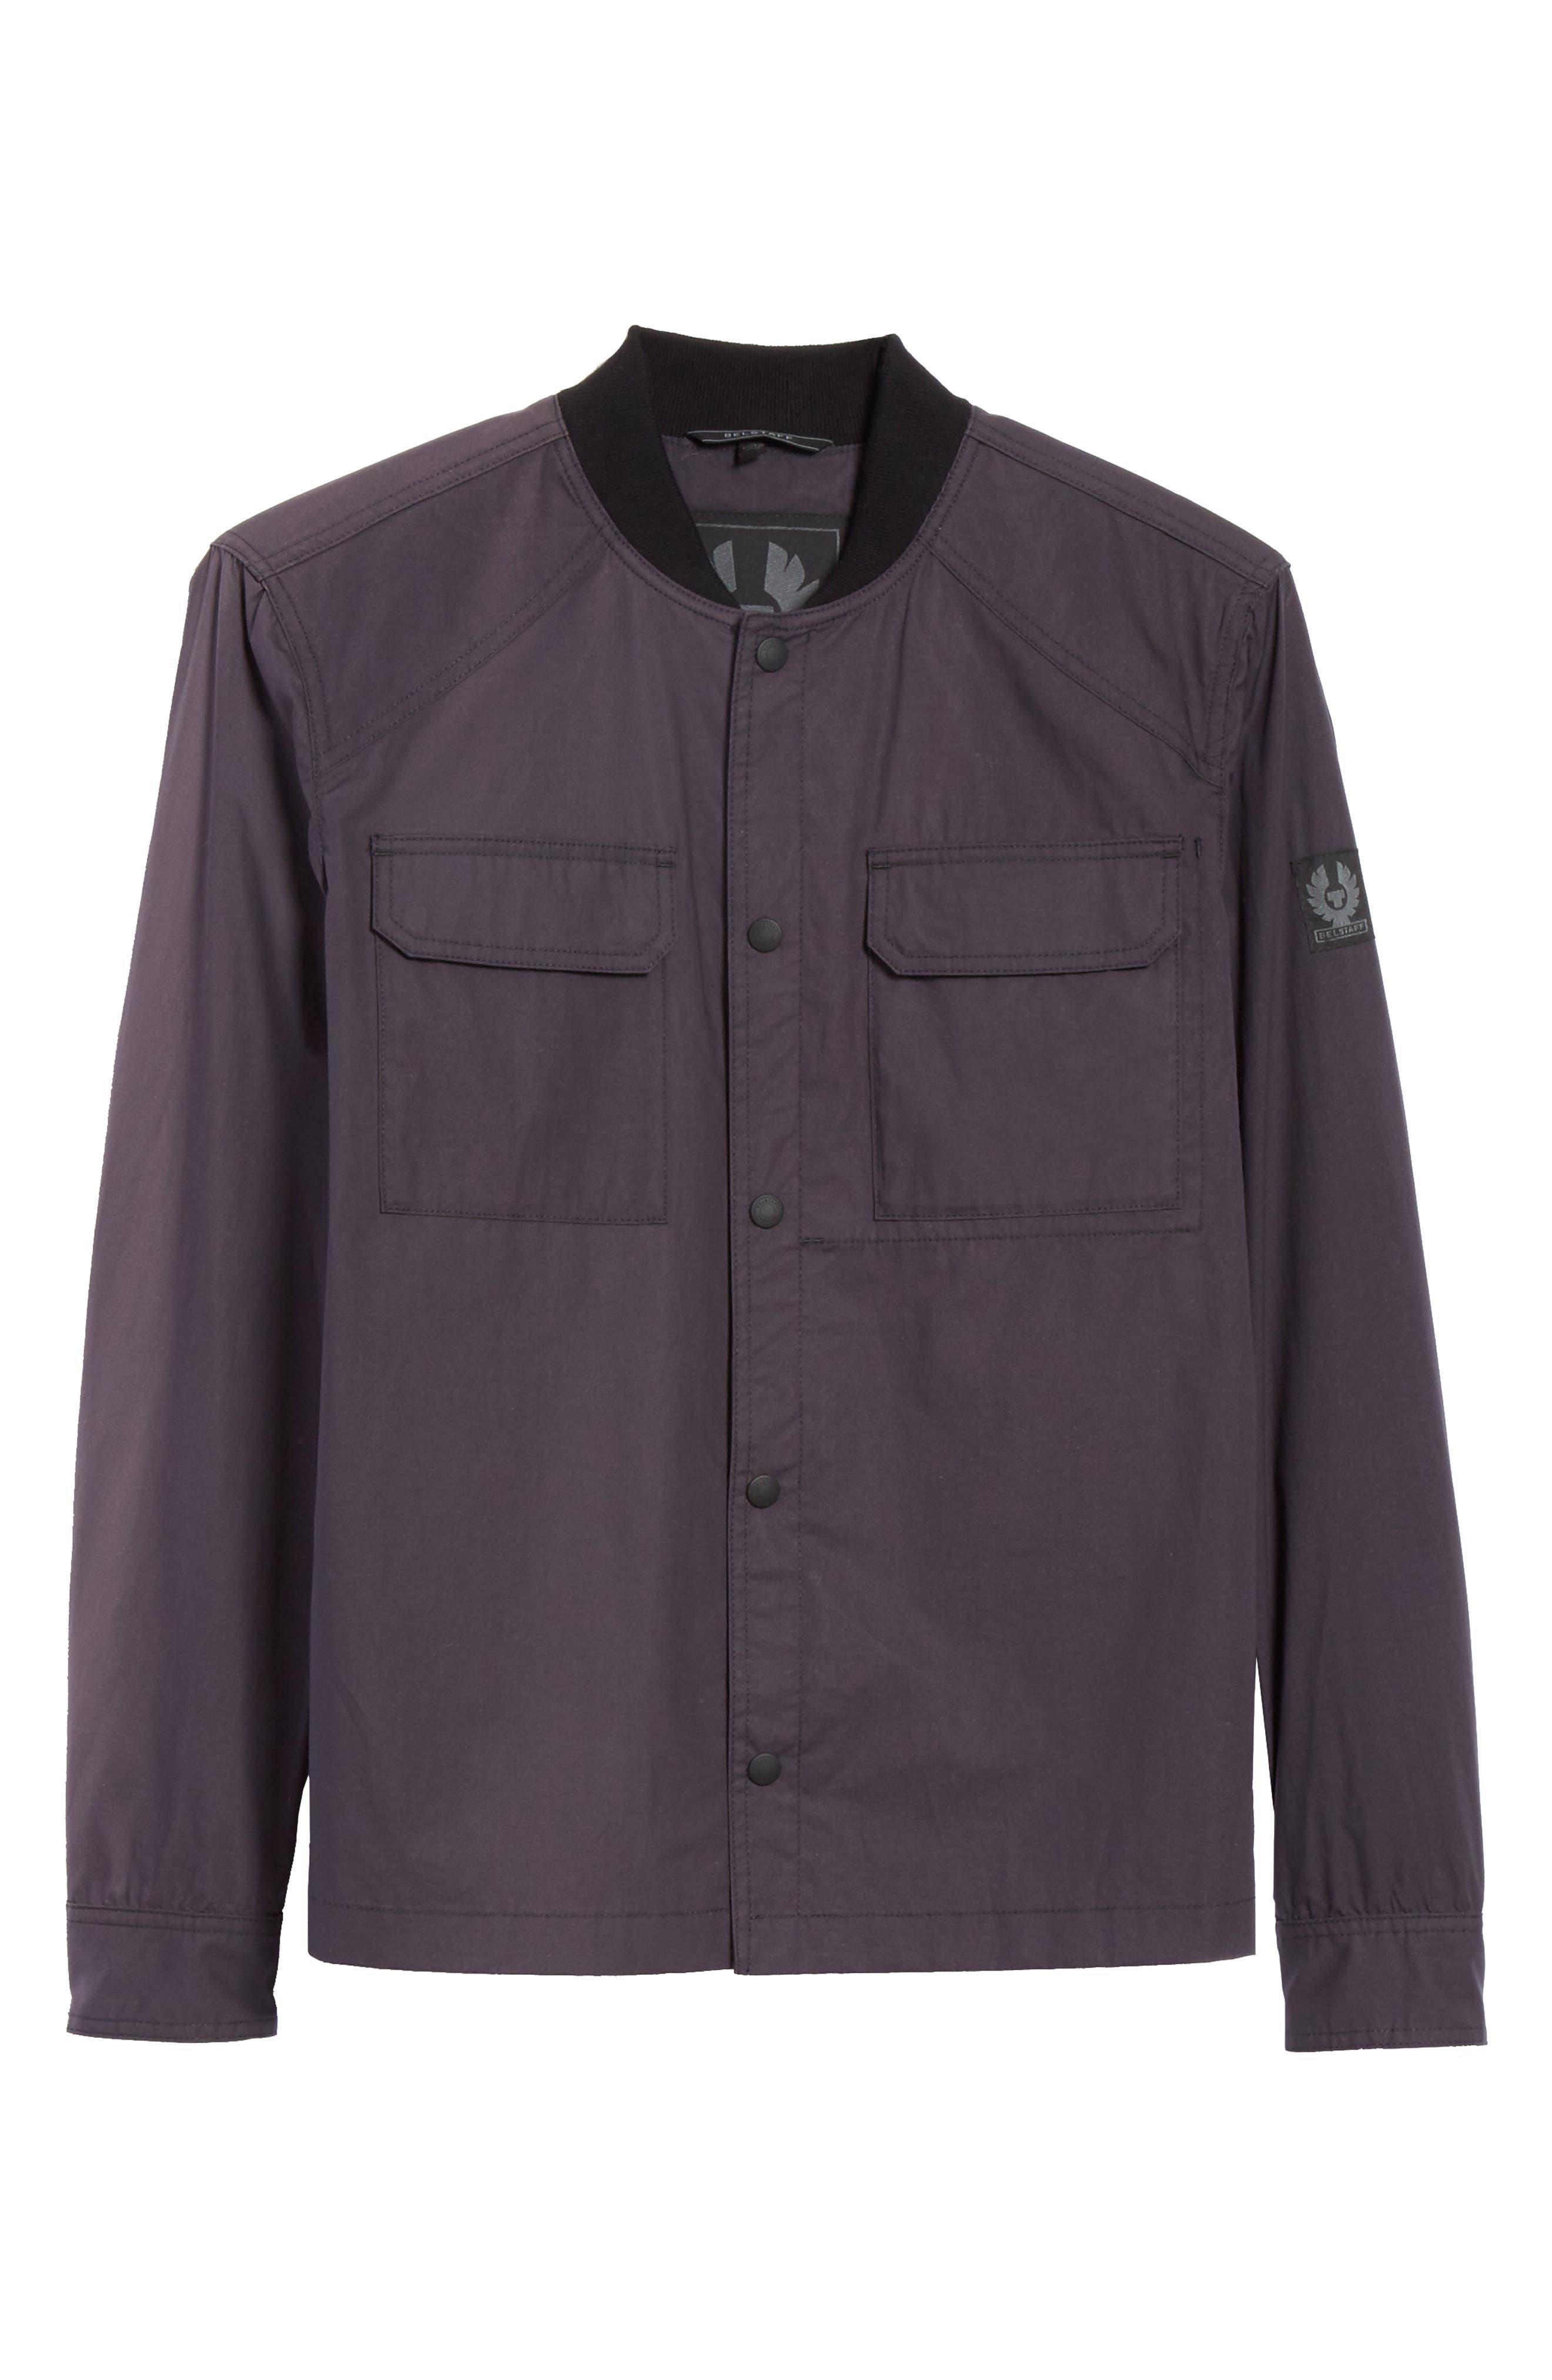 Cardingham Jacket,                             Alternate thumbnail 5, color,                             020